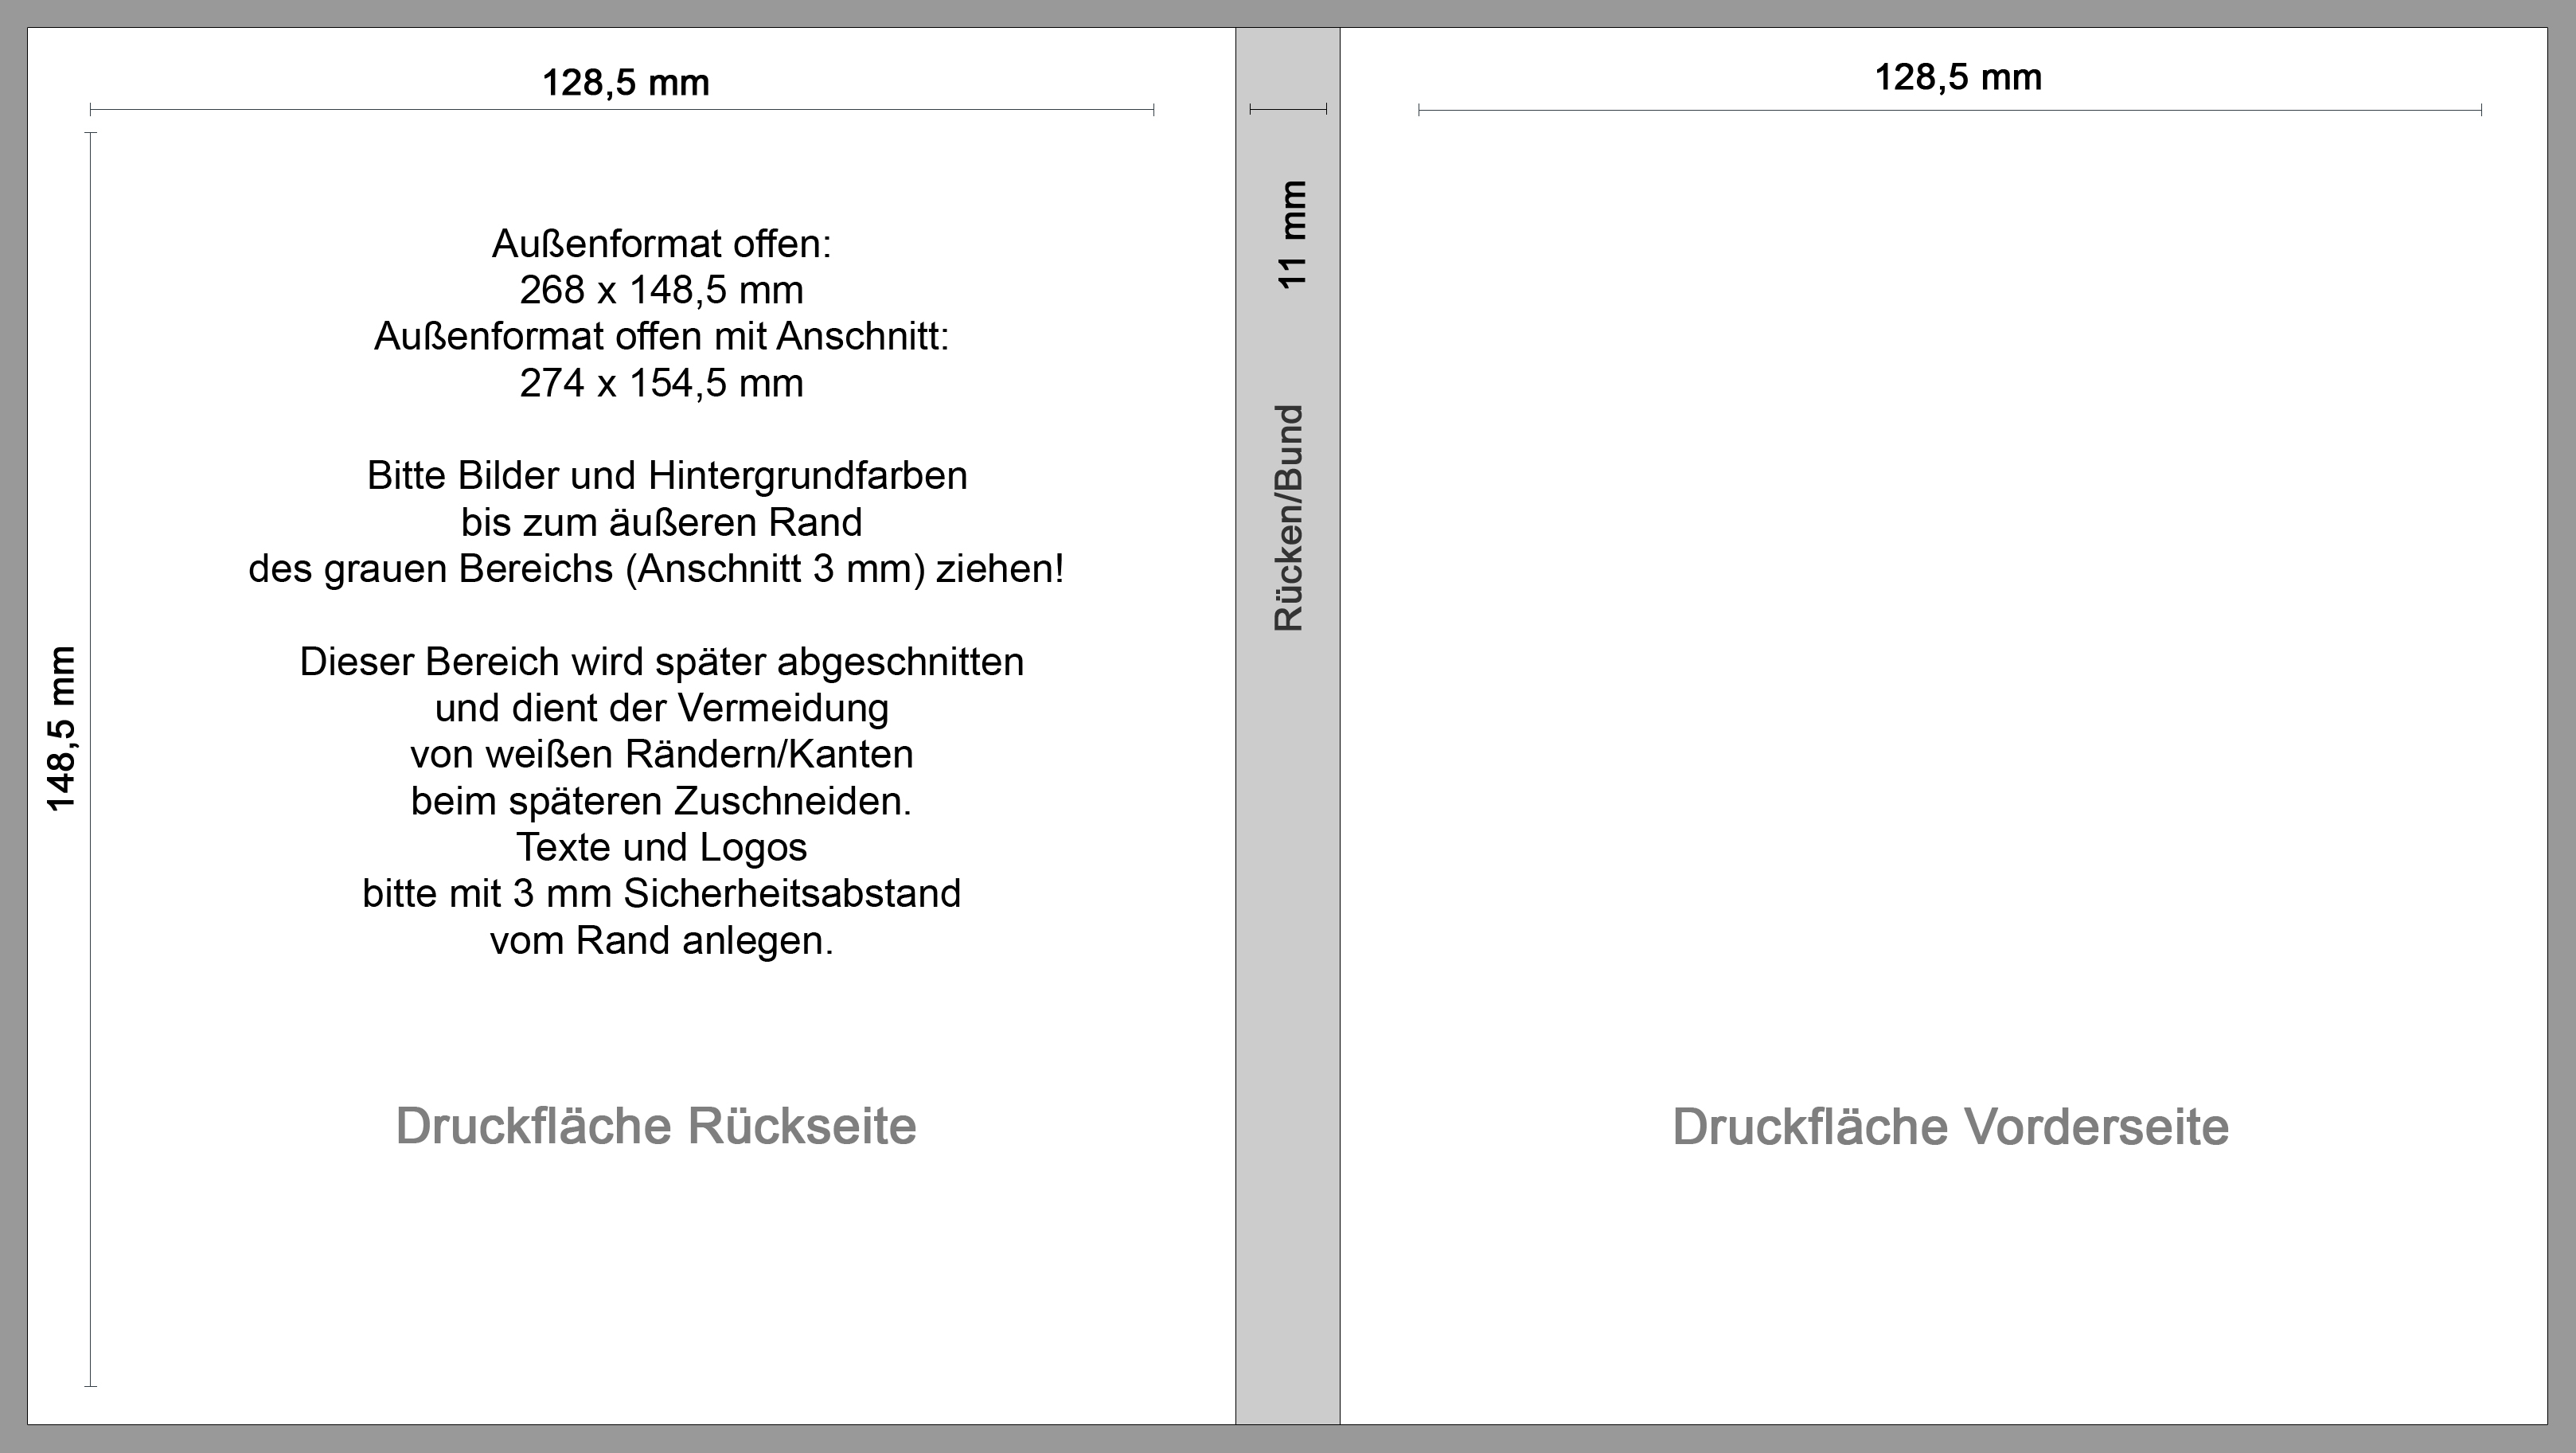 Großartig Programm Cover Vorlagen Galerie - Entry Level Resume ...